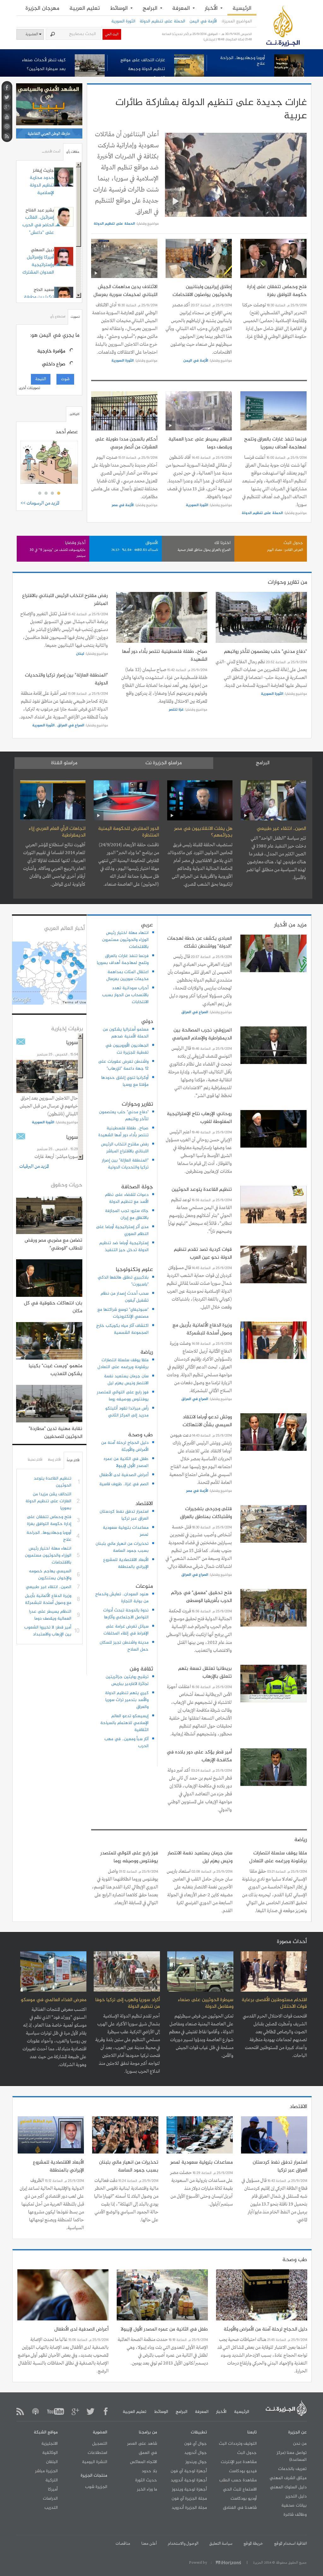 Al Jazeera at Thursday Sept. 25, 2014, 7:11 p.m. UTC